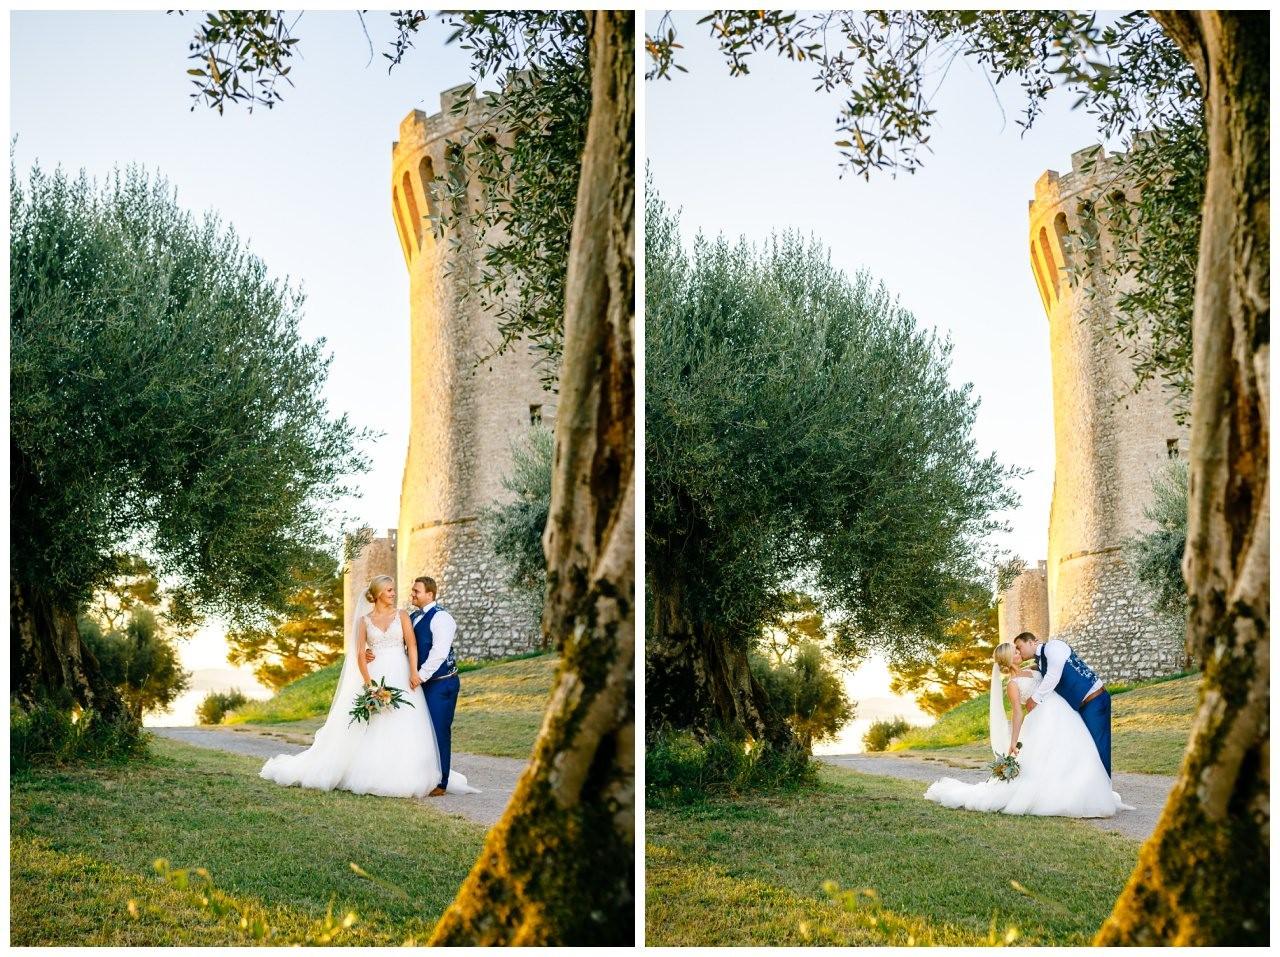 Hochzeitsfotos Toskana Fotograf After Wedding Shooting Italien 17 - After Wedding Shooting in der Toskana